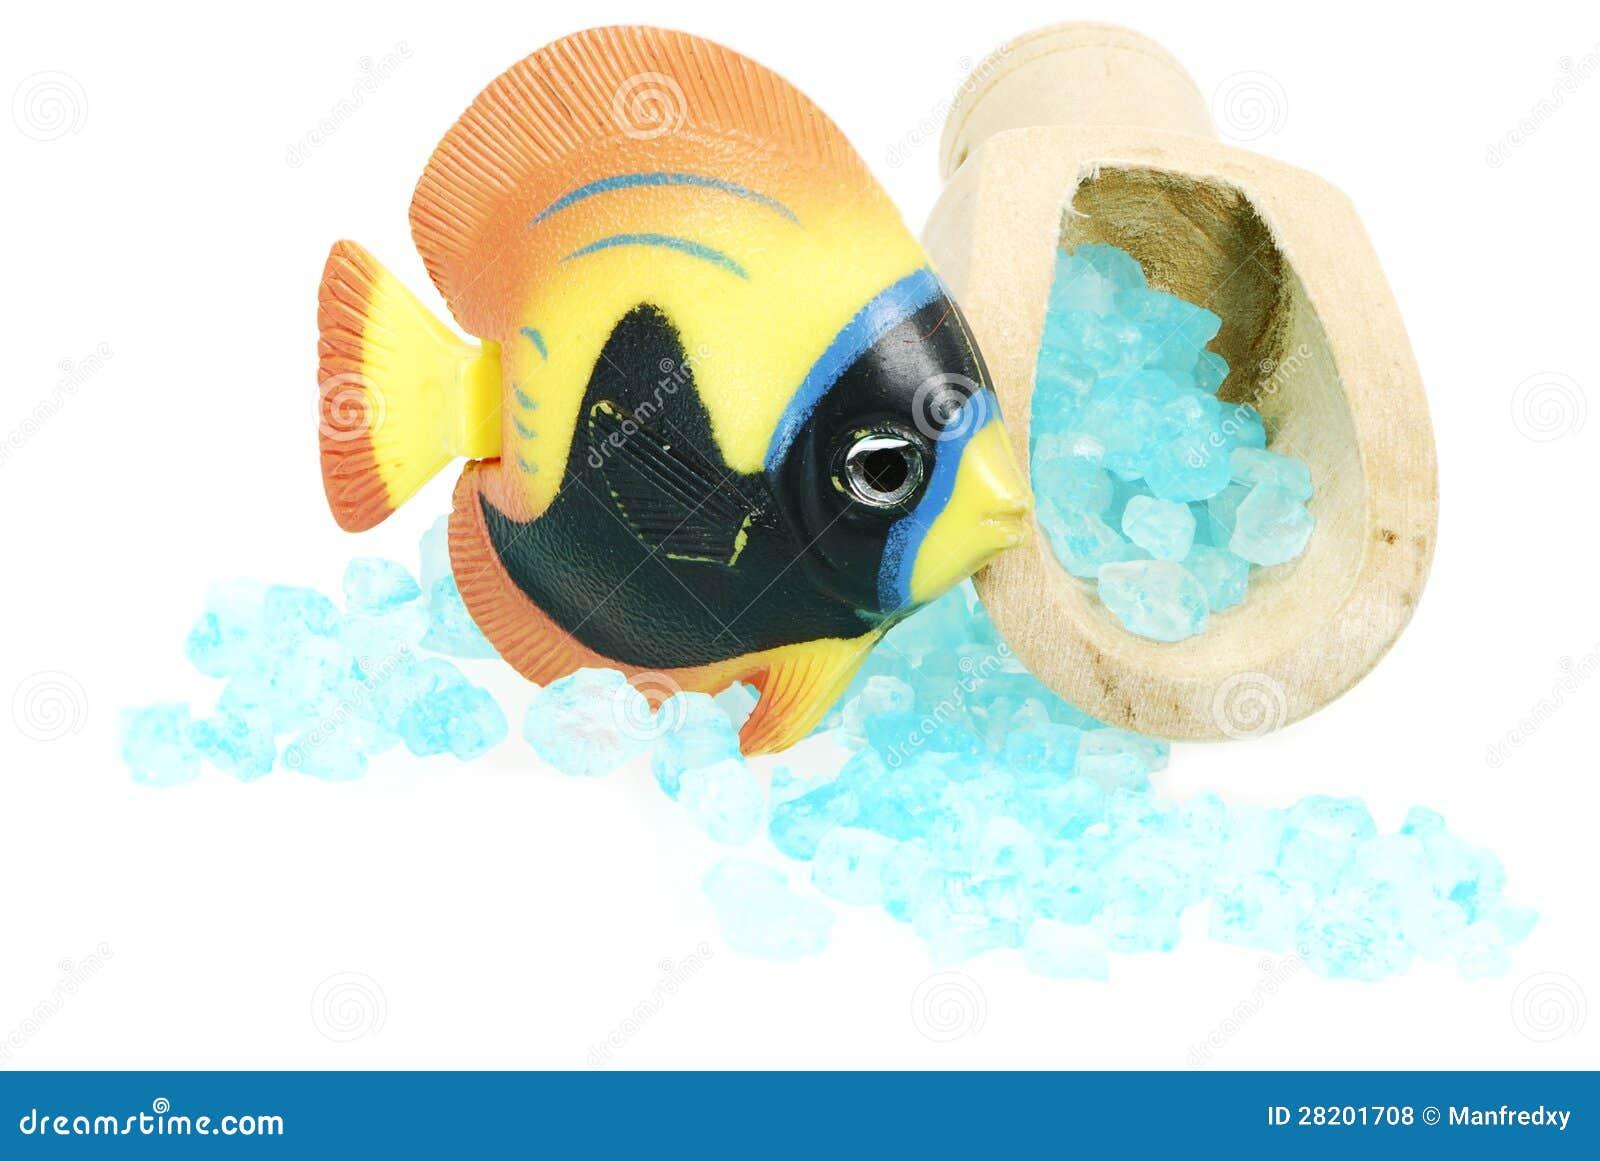 Bath salt and fish royalty free stock photos image 28201708 for Salt bath for fish